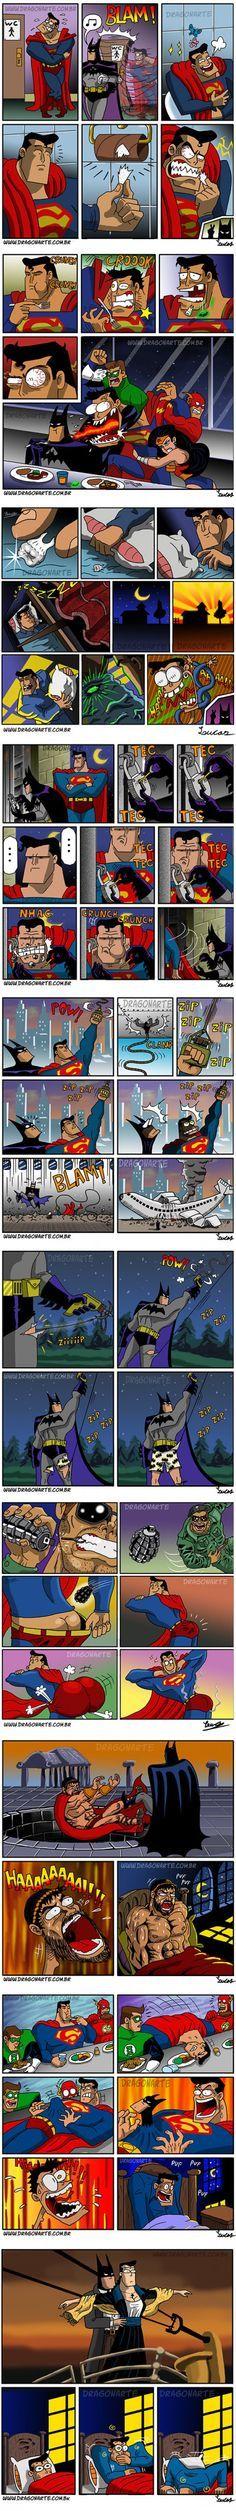 Batman & Superman Love it? Follow us for more fandom pins!